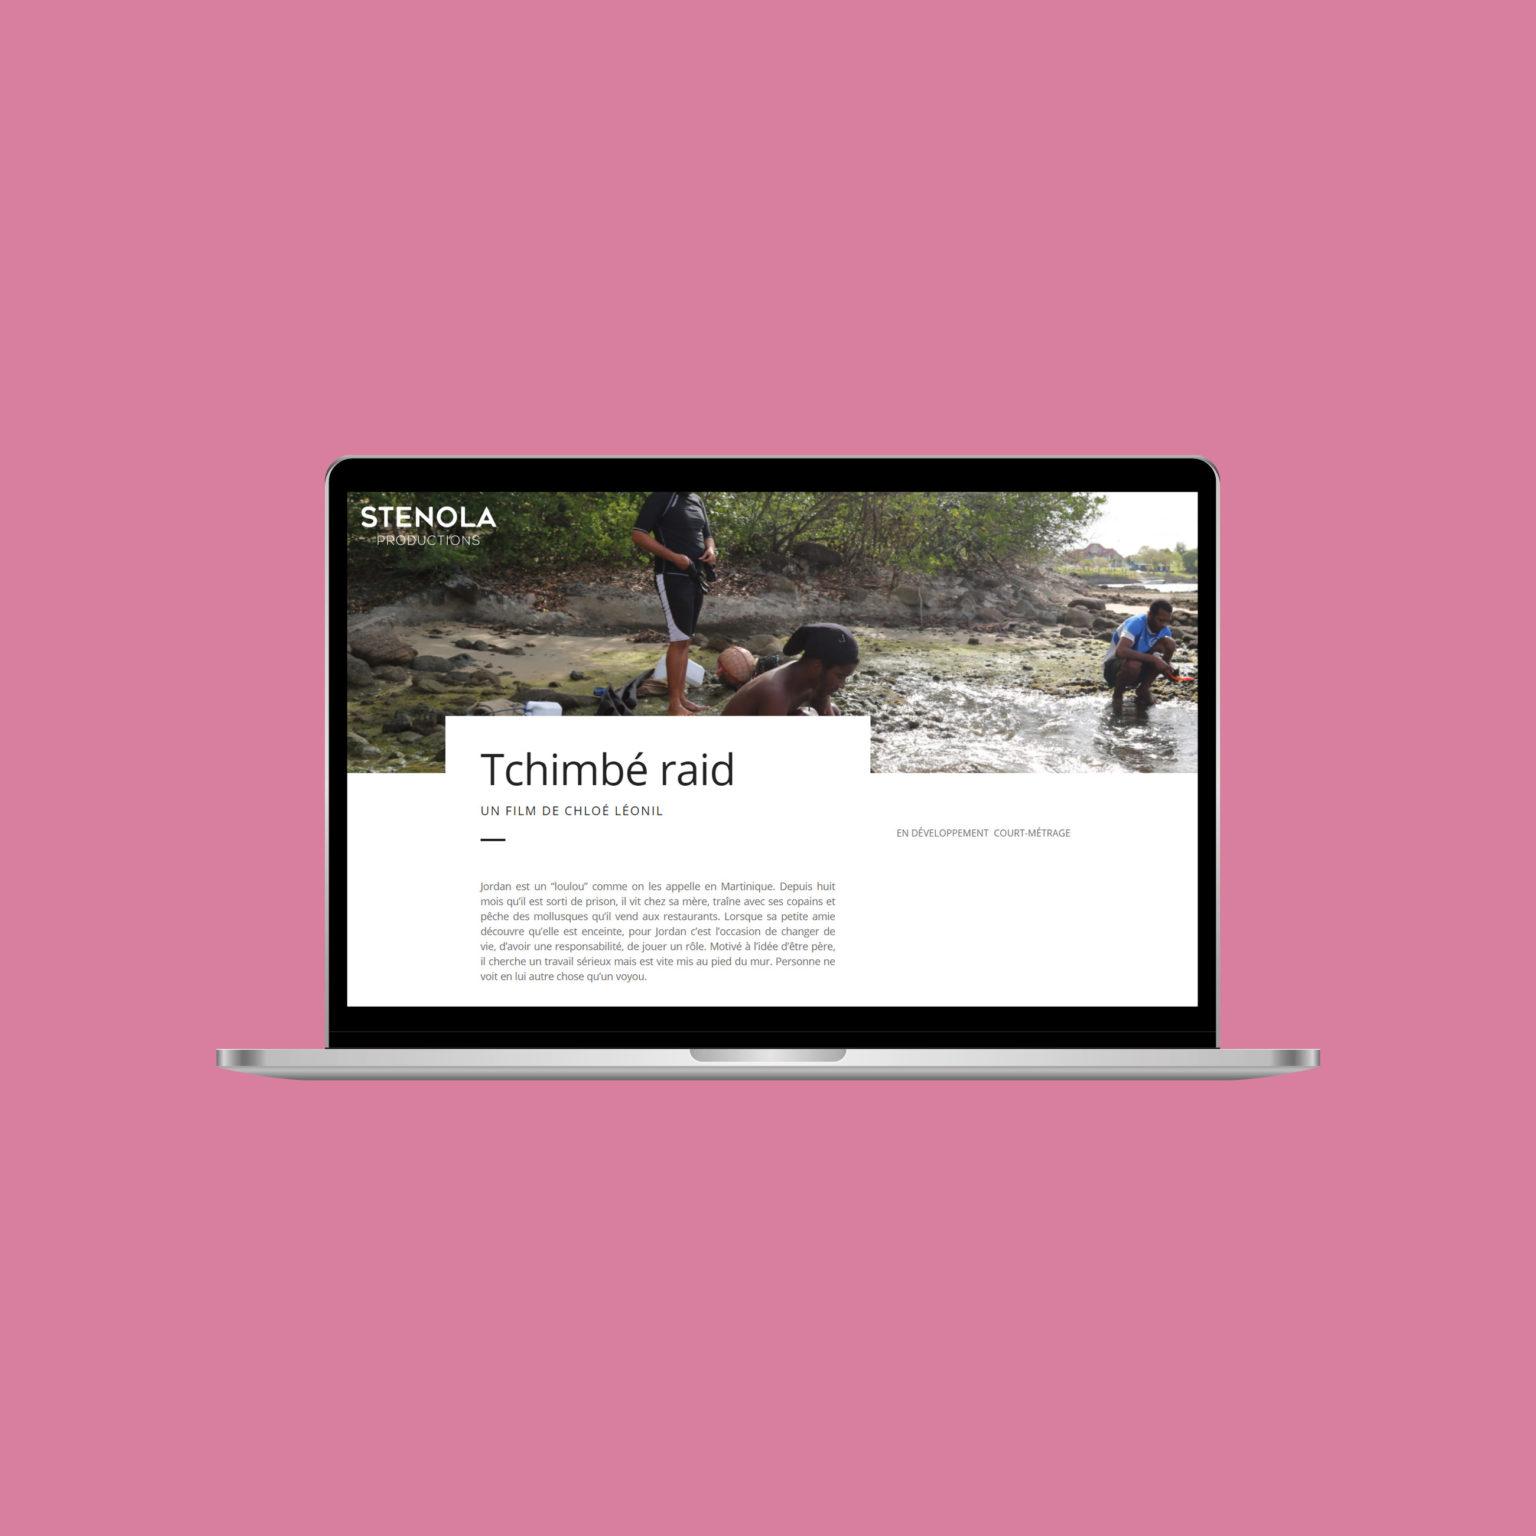 Miko Digital Agence web à Liège - Stenola Productions